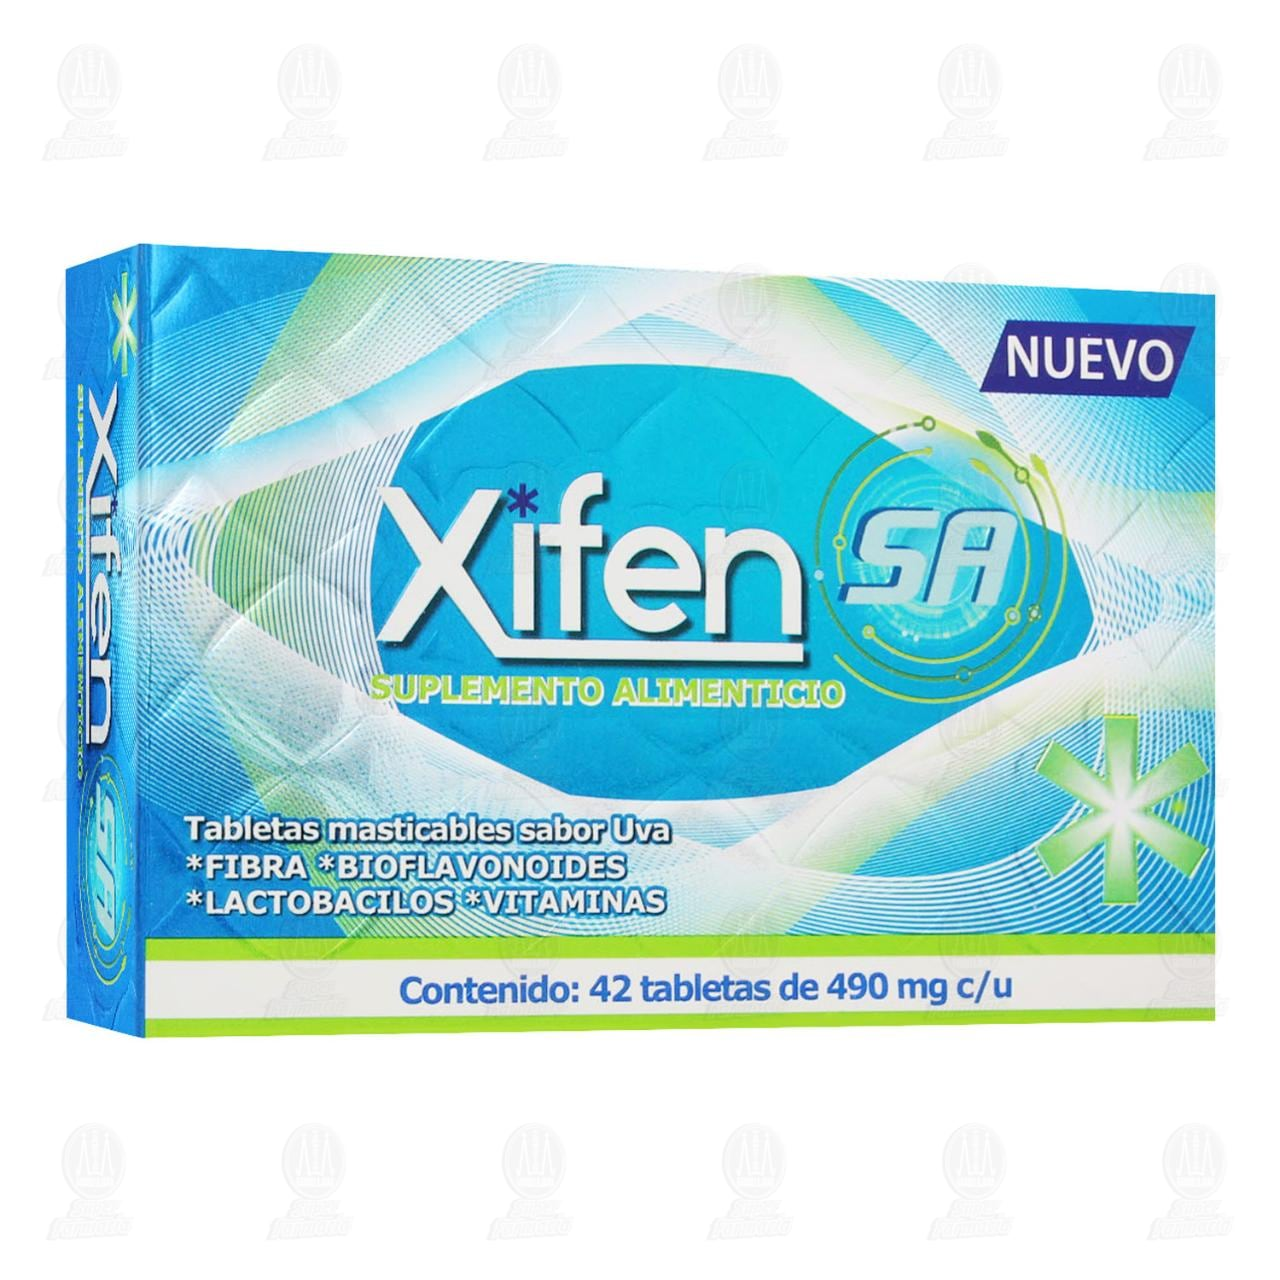 Xifer SA 490mg UVA 42 Tabletas Masticables